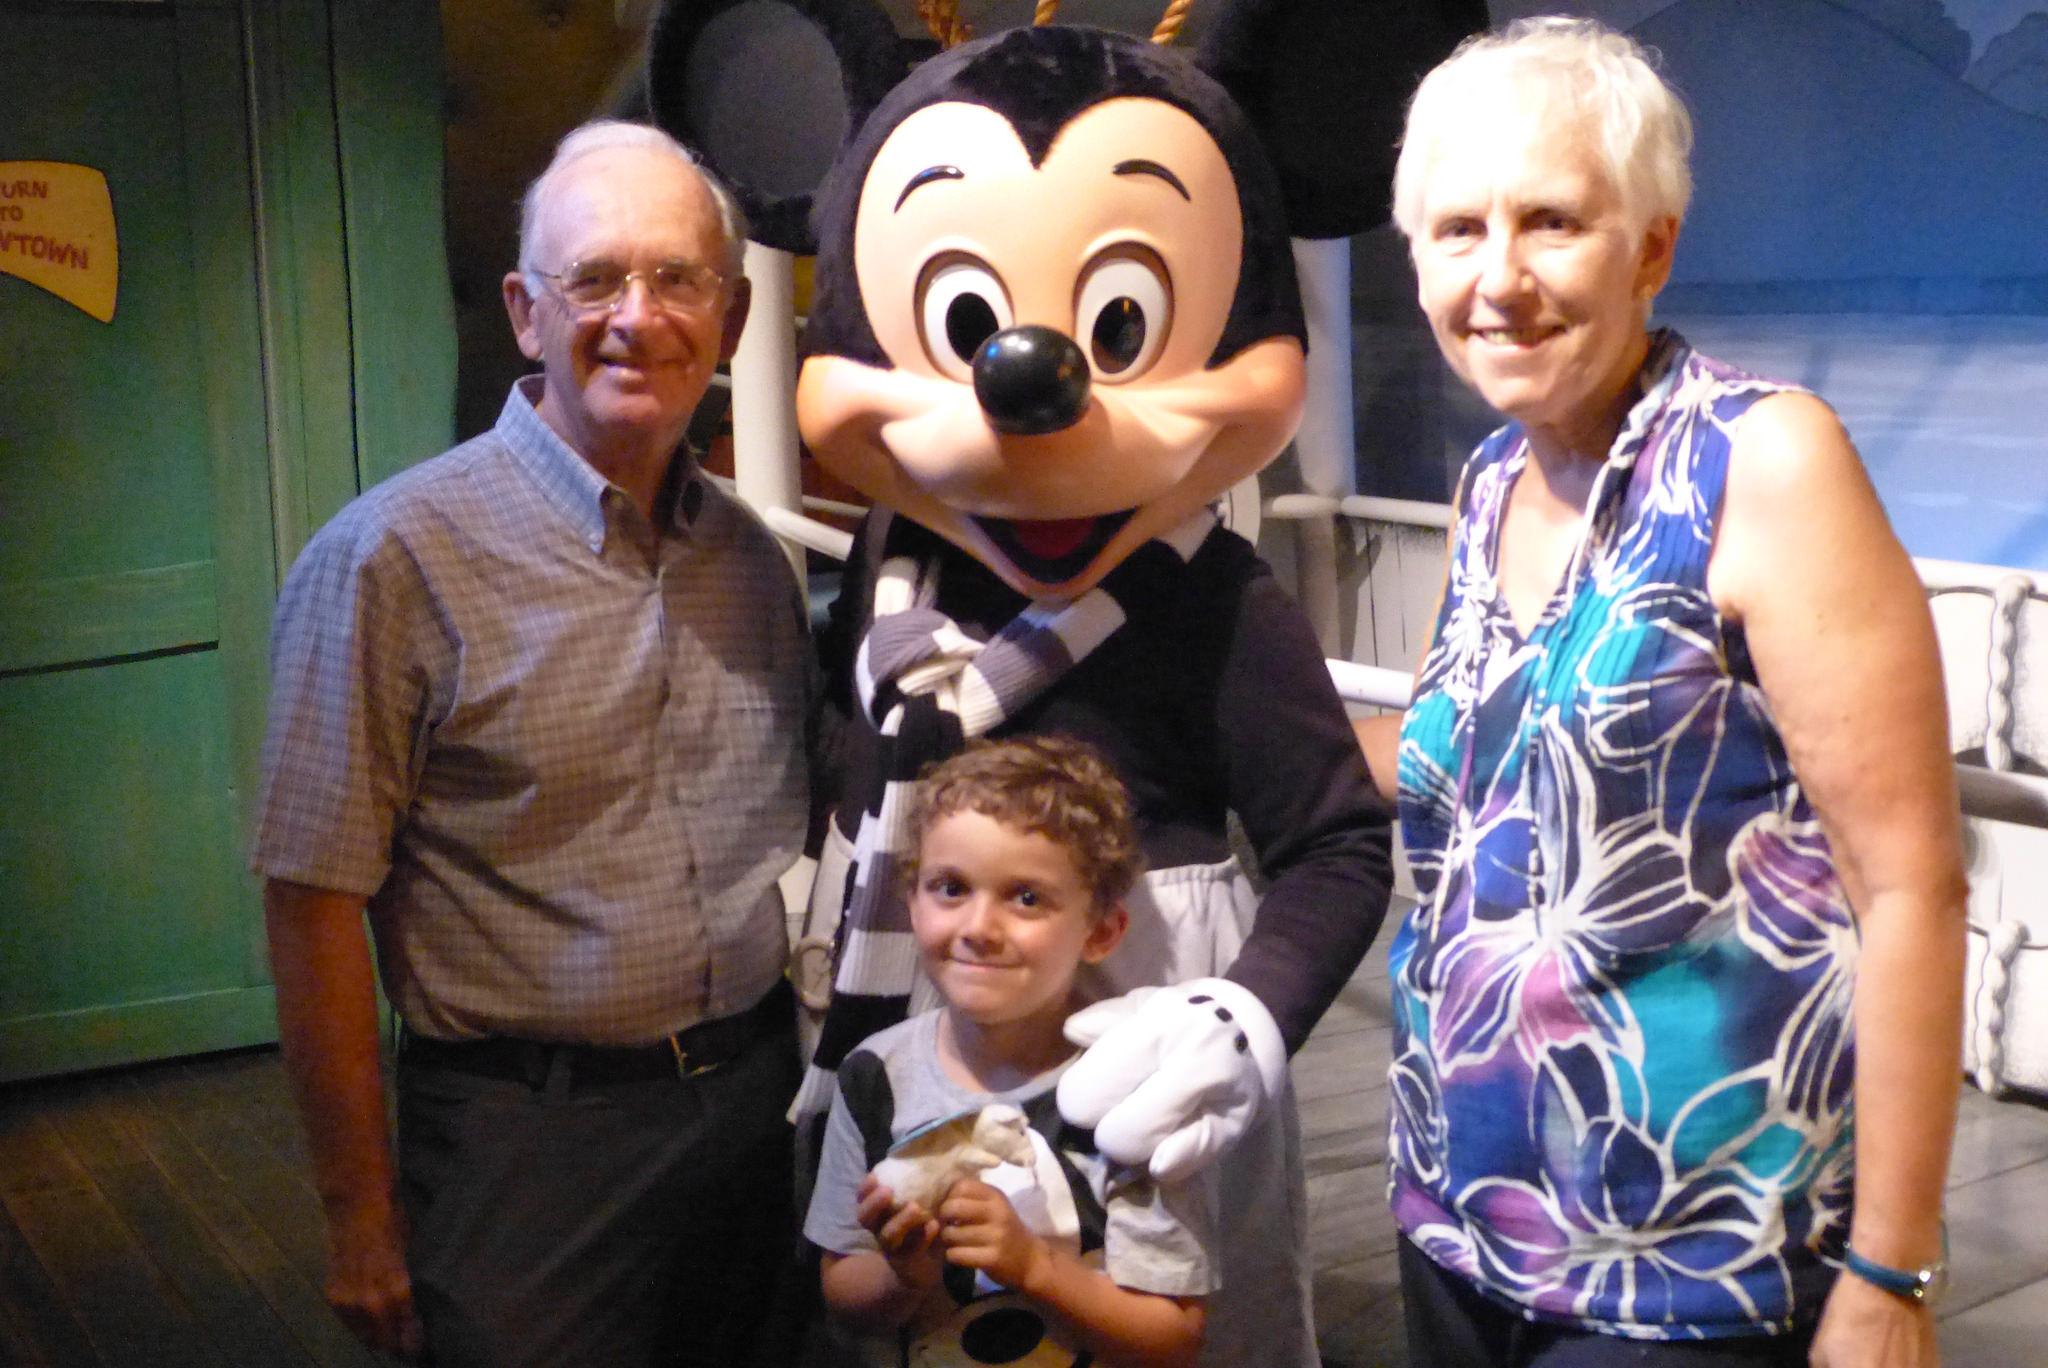 Charlie and Nana and Grandpapa with Mickey